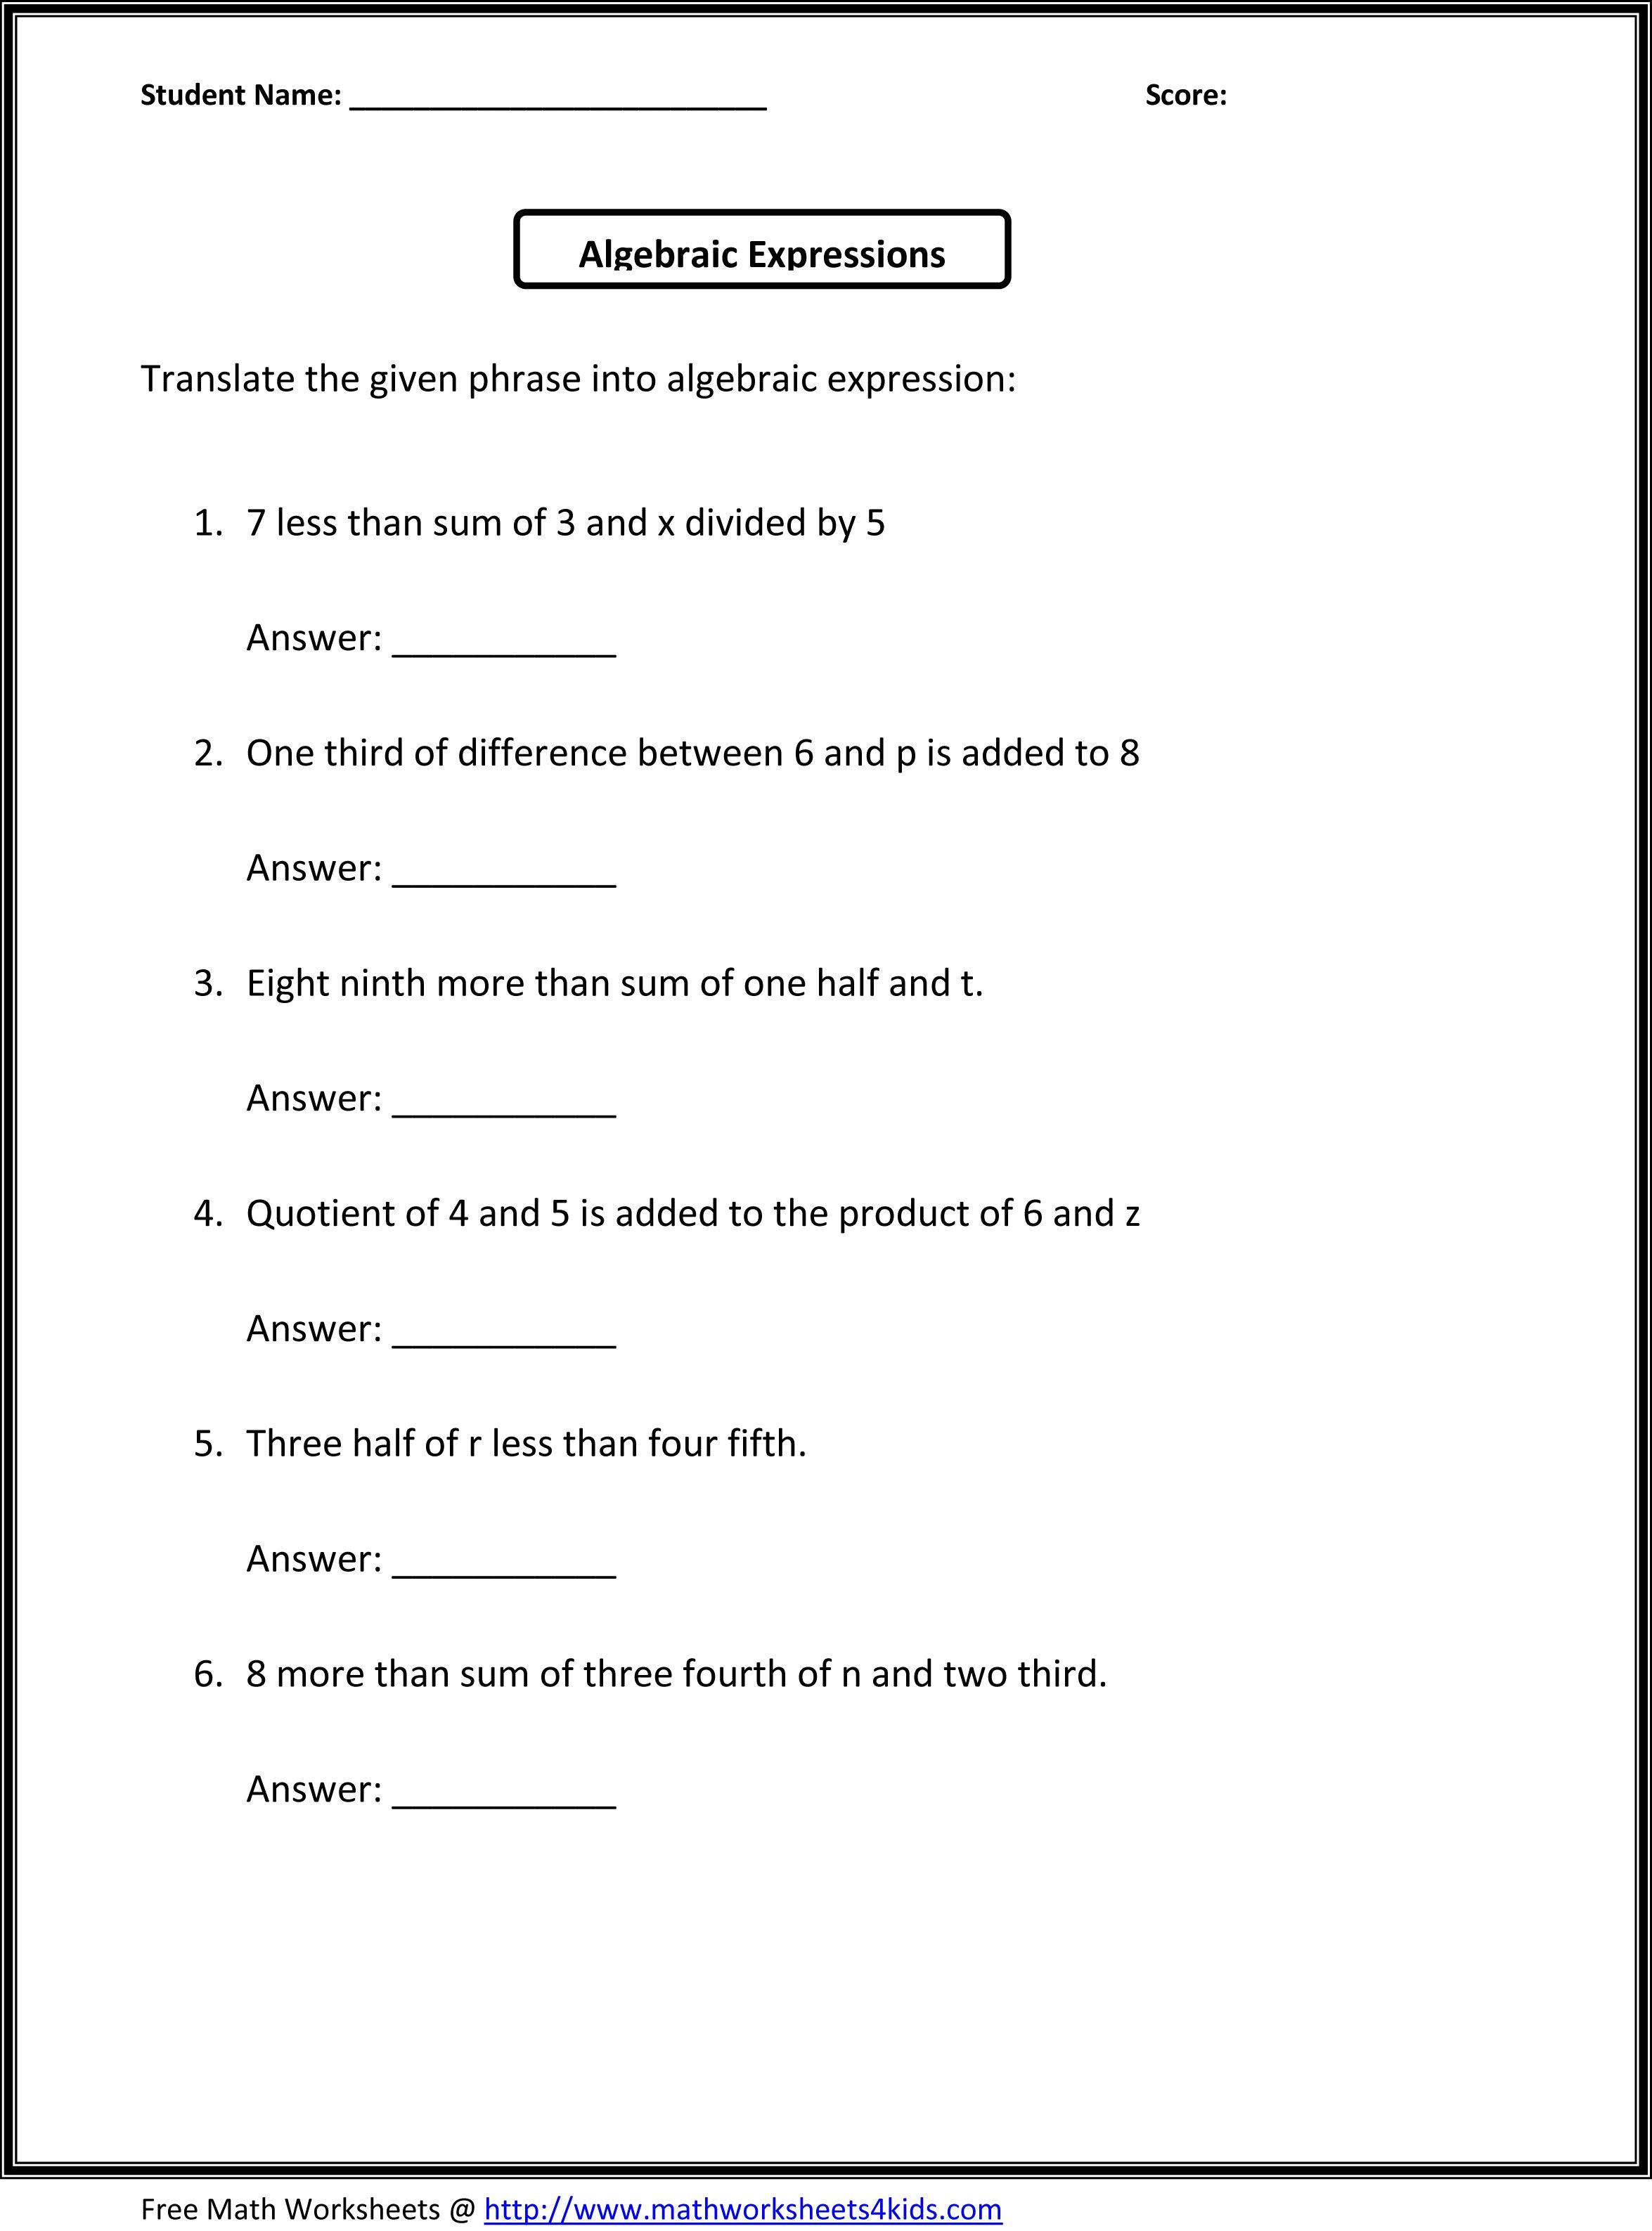 Cute Writing Algebraic Expressions Worksheet 6th Grade Ideas